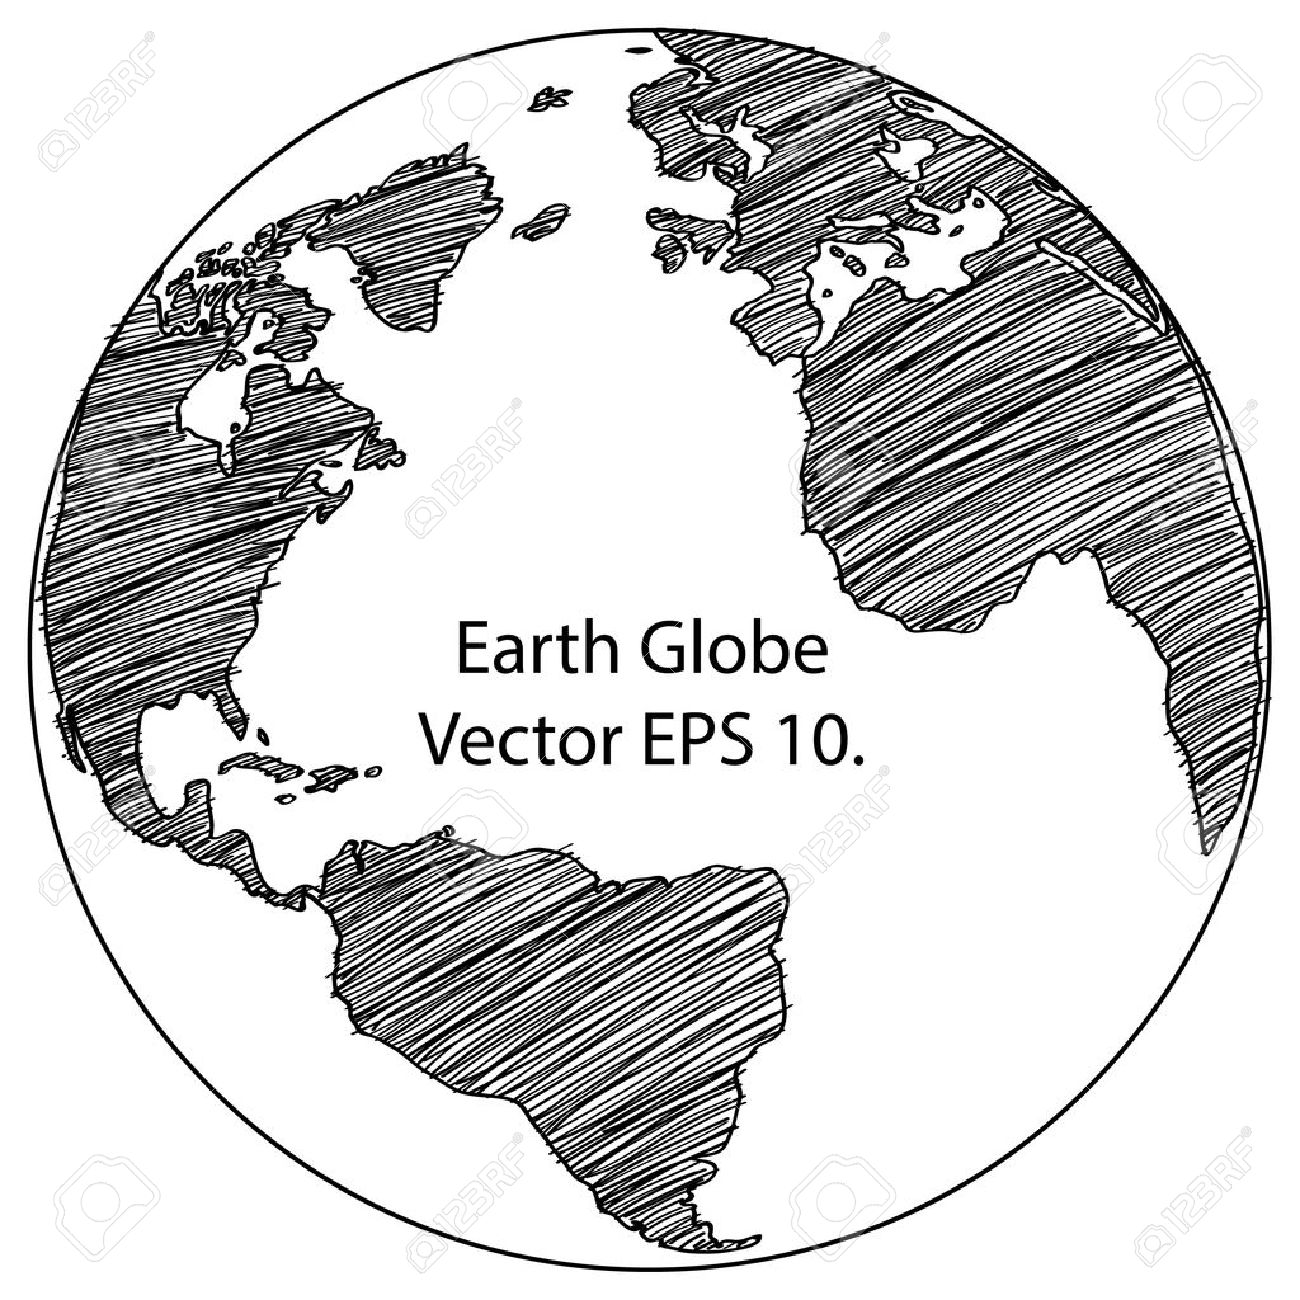 World map tierra lnea globe vector bosquejada arriba illustrator foto de archivo world map tierra lnea globe vector bosquejada arriba illustrator eps 10 gumiabroncs Gallery